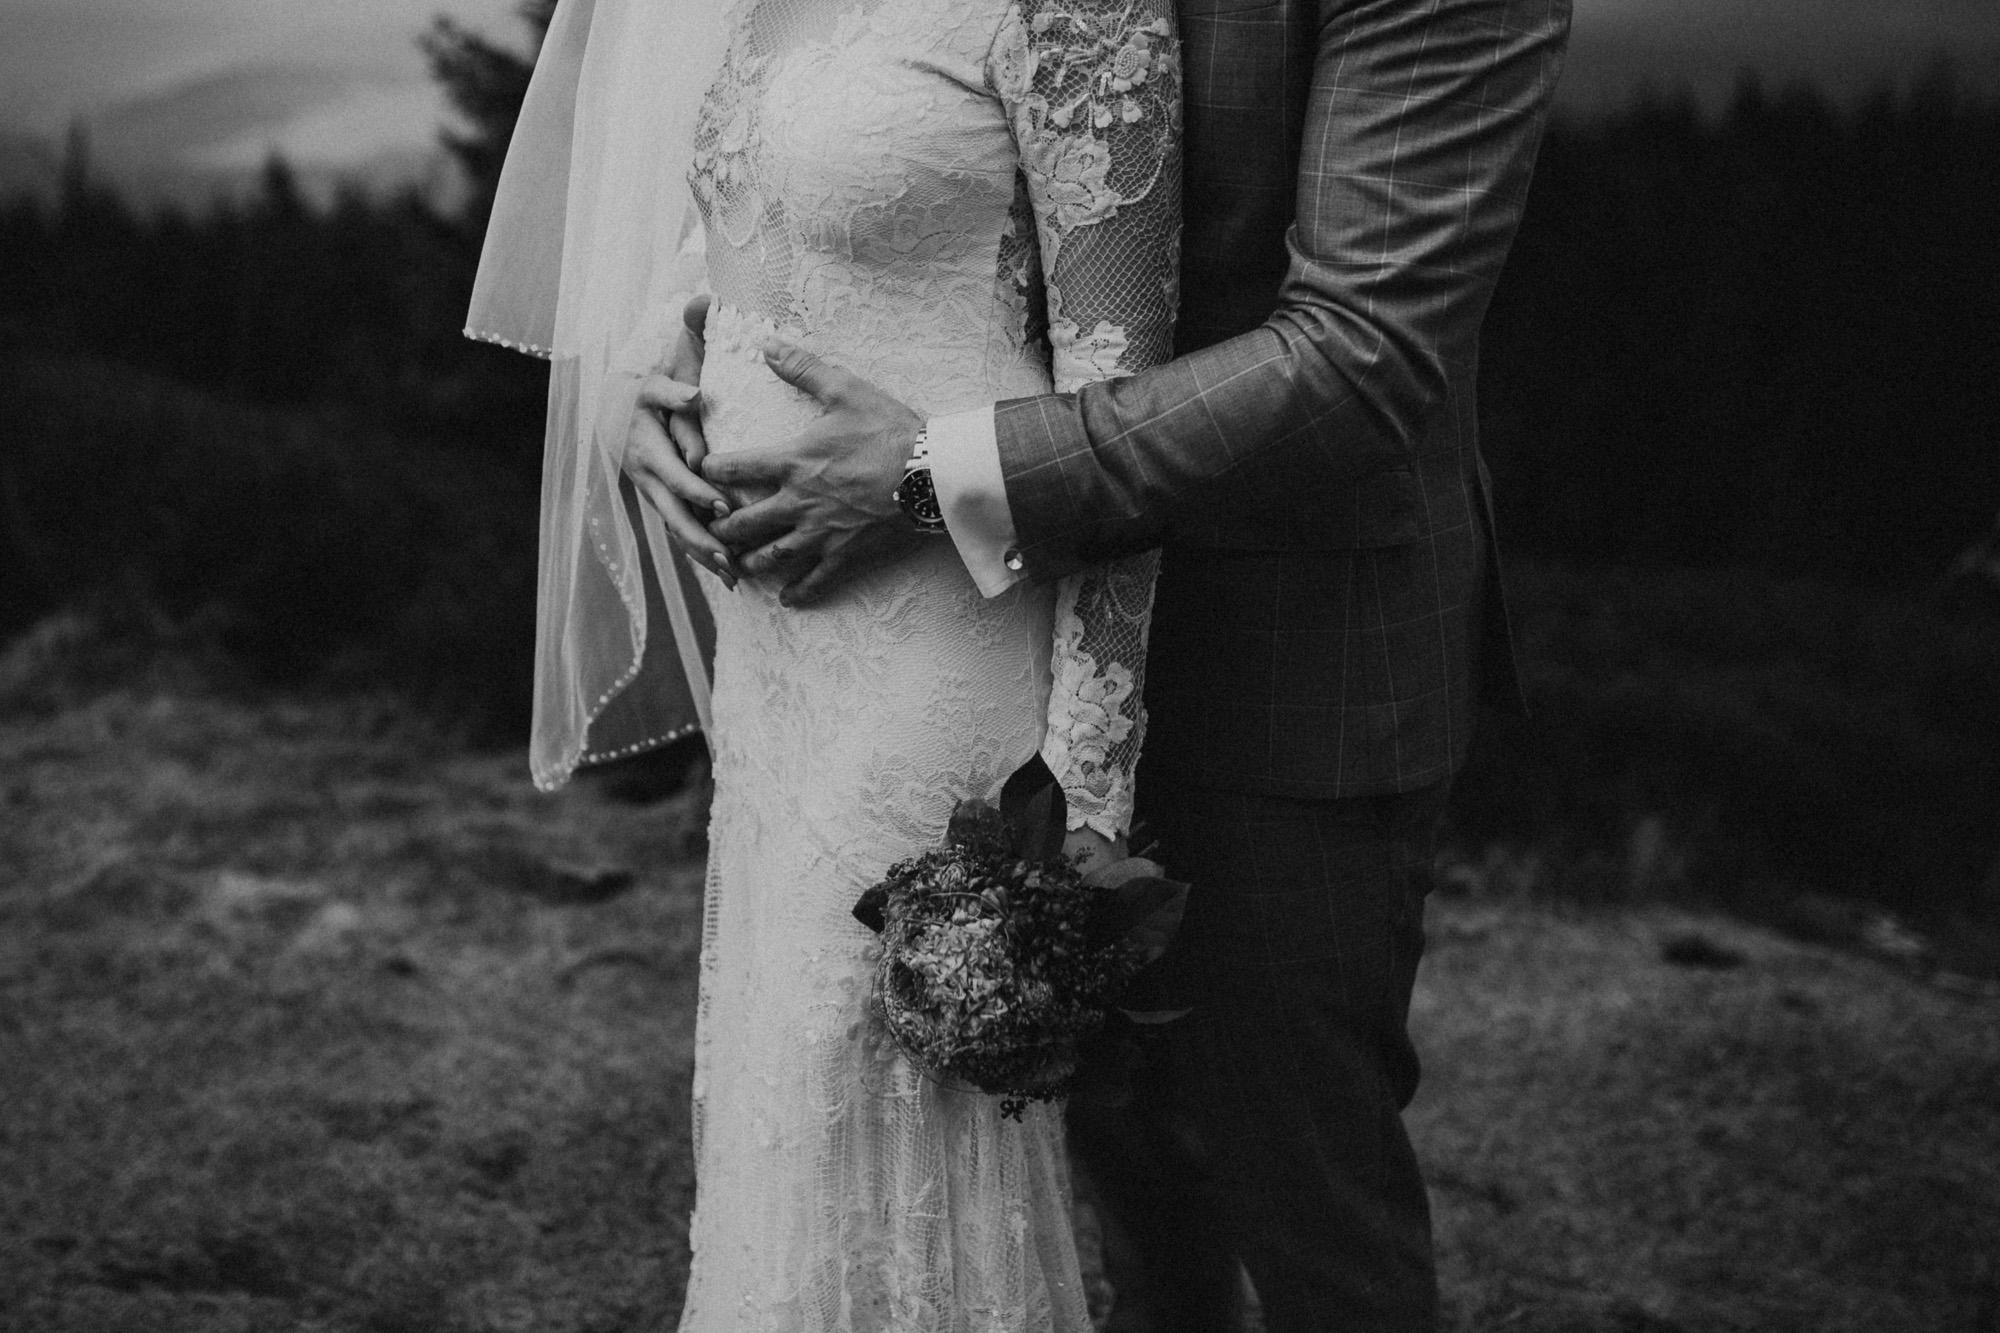 DanielaMarquardtPhotography_Hochzeitsfotograf_Düsseldorf_Köln_Mallorca_Bayern_Austria_Harz_LinaundMaik_Afterwedding-Shooting_Weddingphotographer_Ibiza_Tuskany_Italien_Toskana87